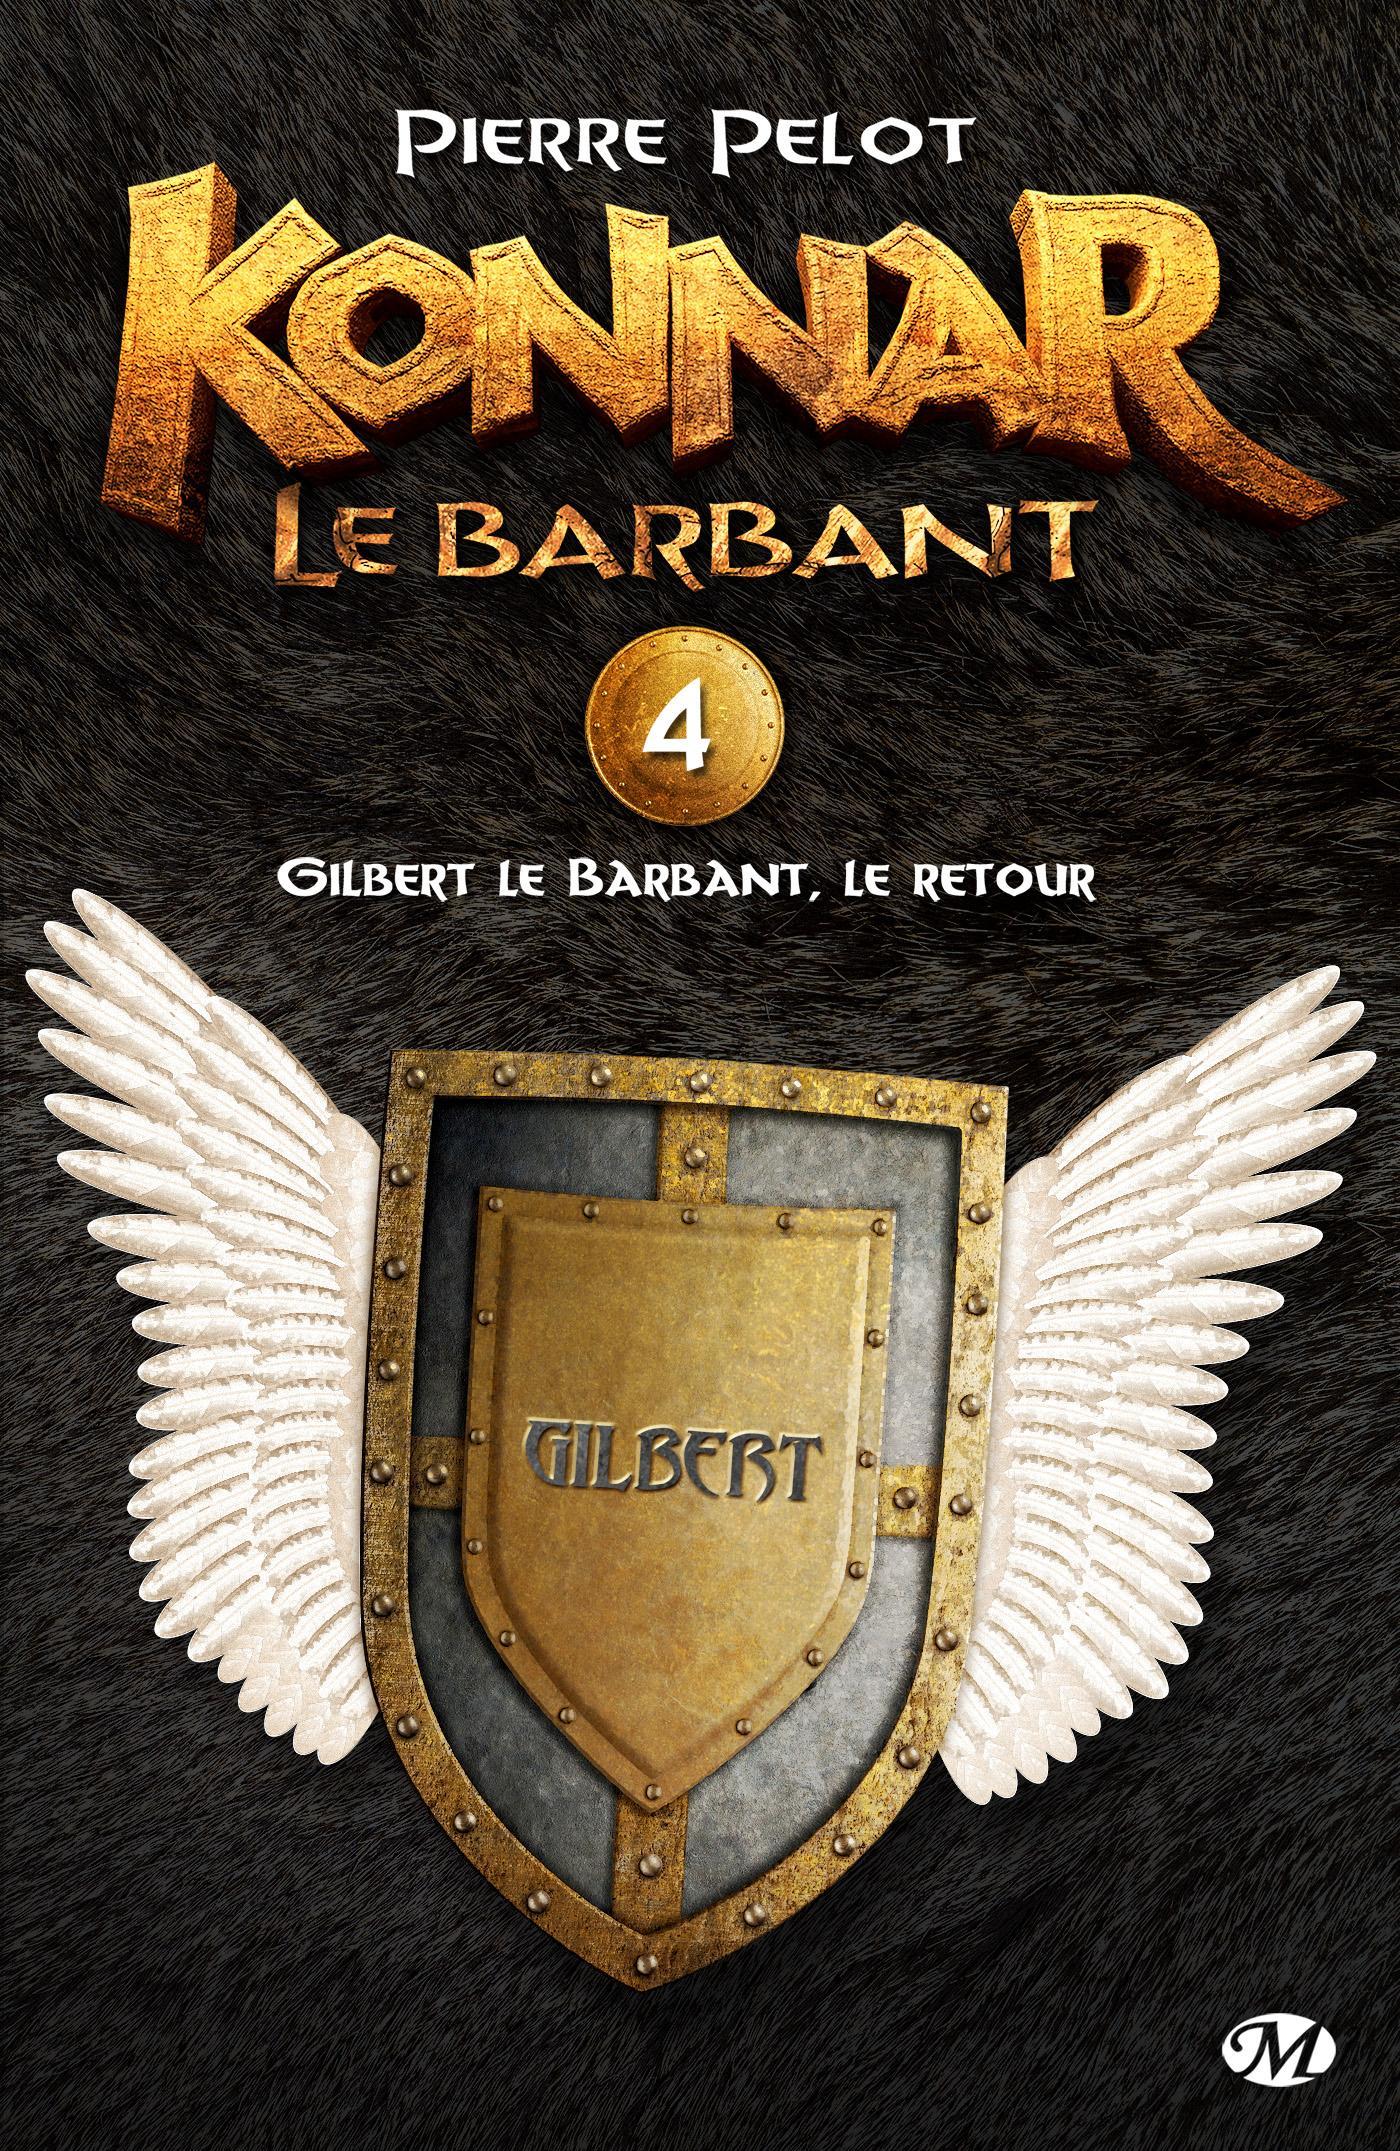 Gilbert le Barbant, le retour, KONNAR LE BARBANT, T4